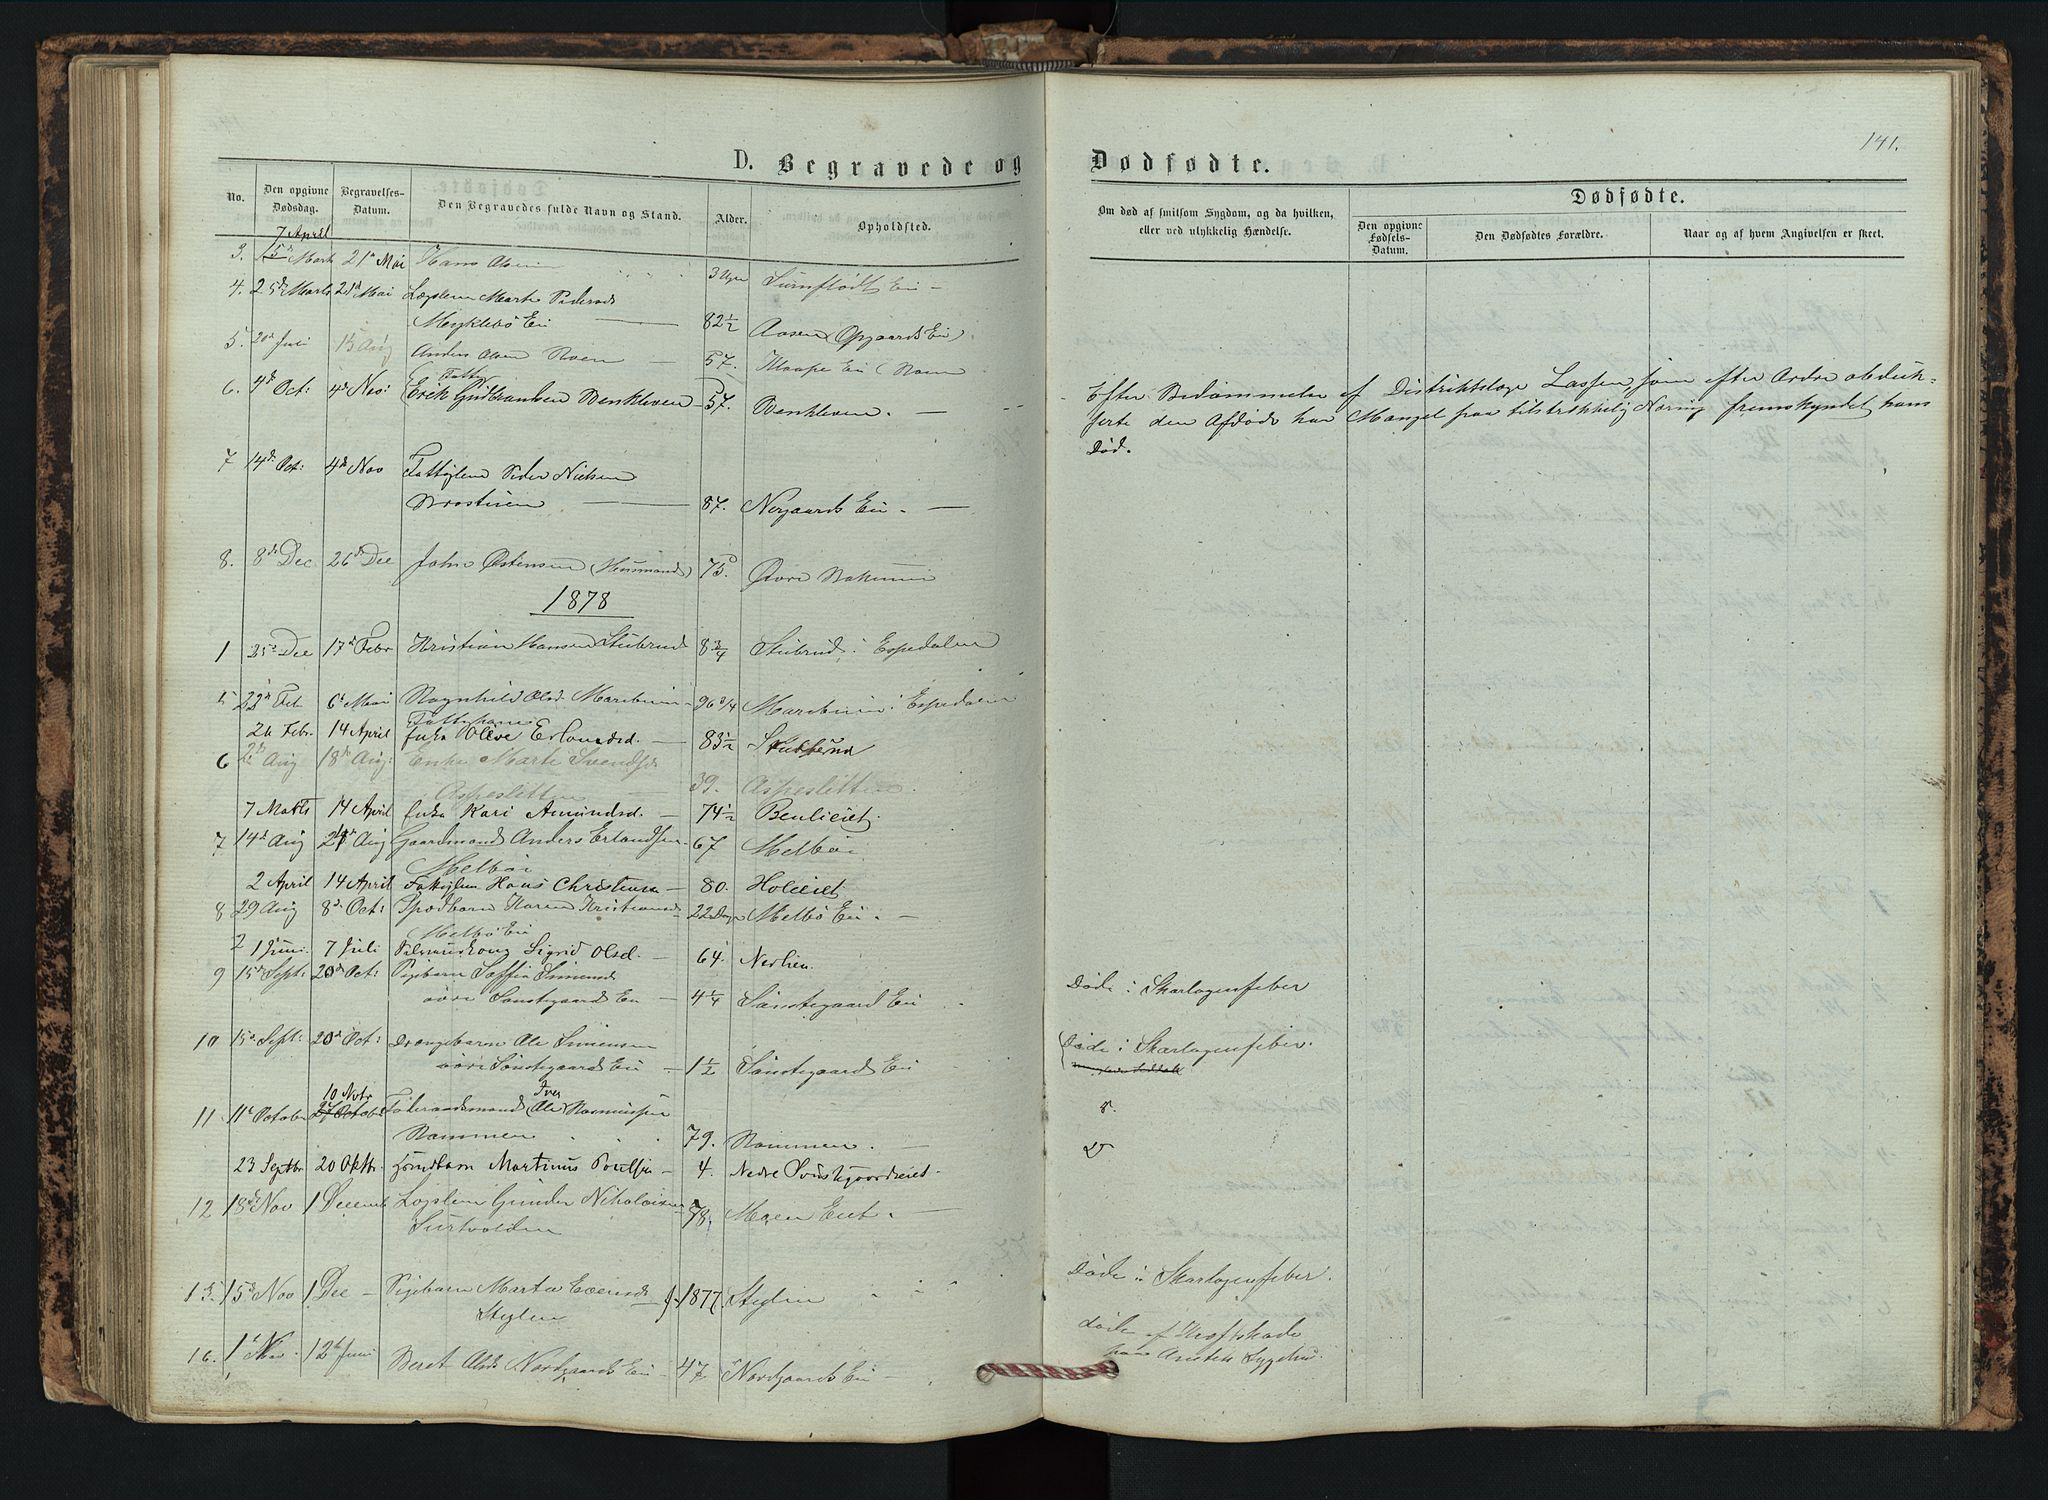 SAH, Vestre Gausdal prestekontor, Klokkerbok nr. 2, 1874-1897, s. 141